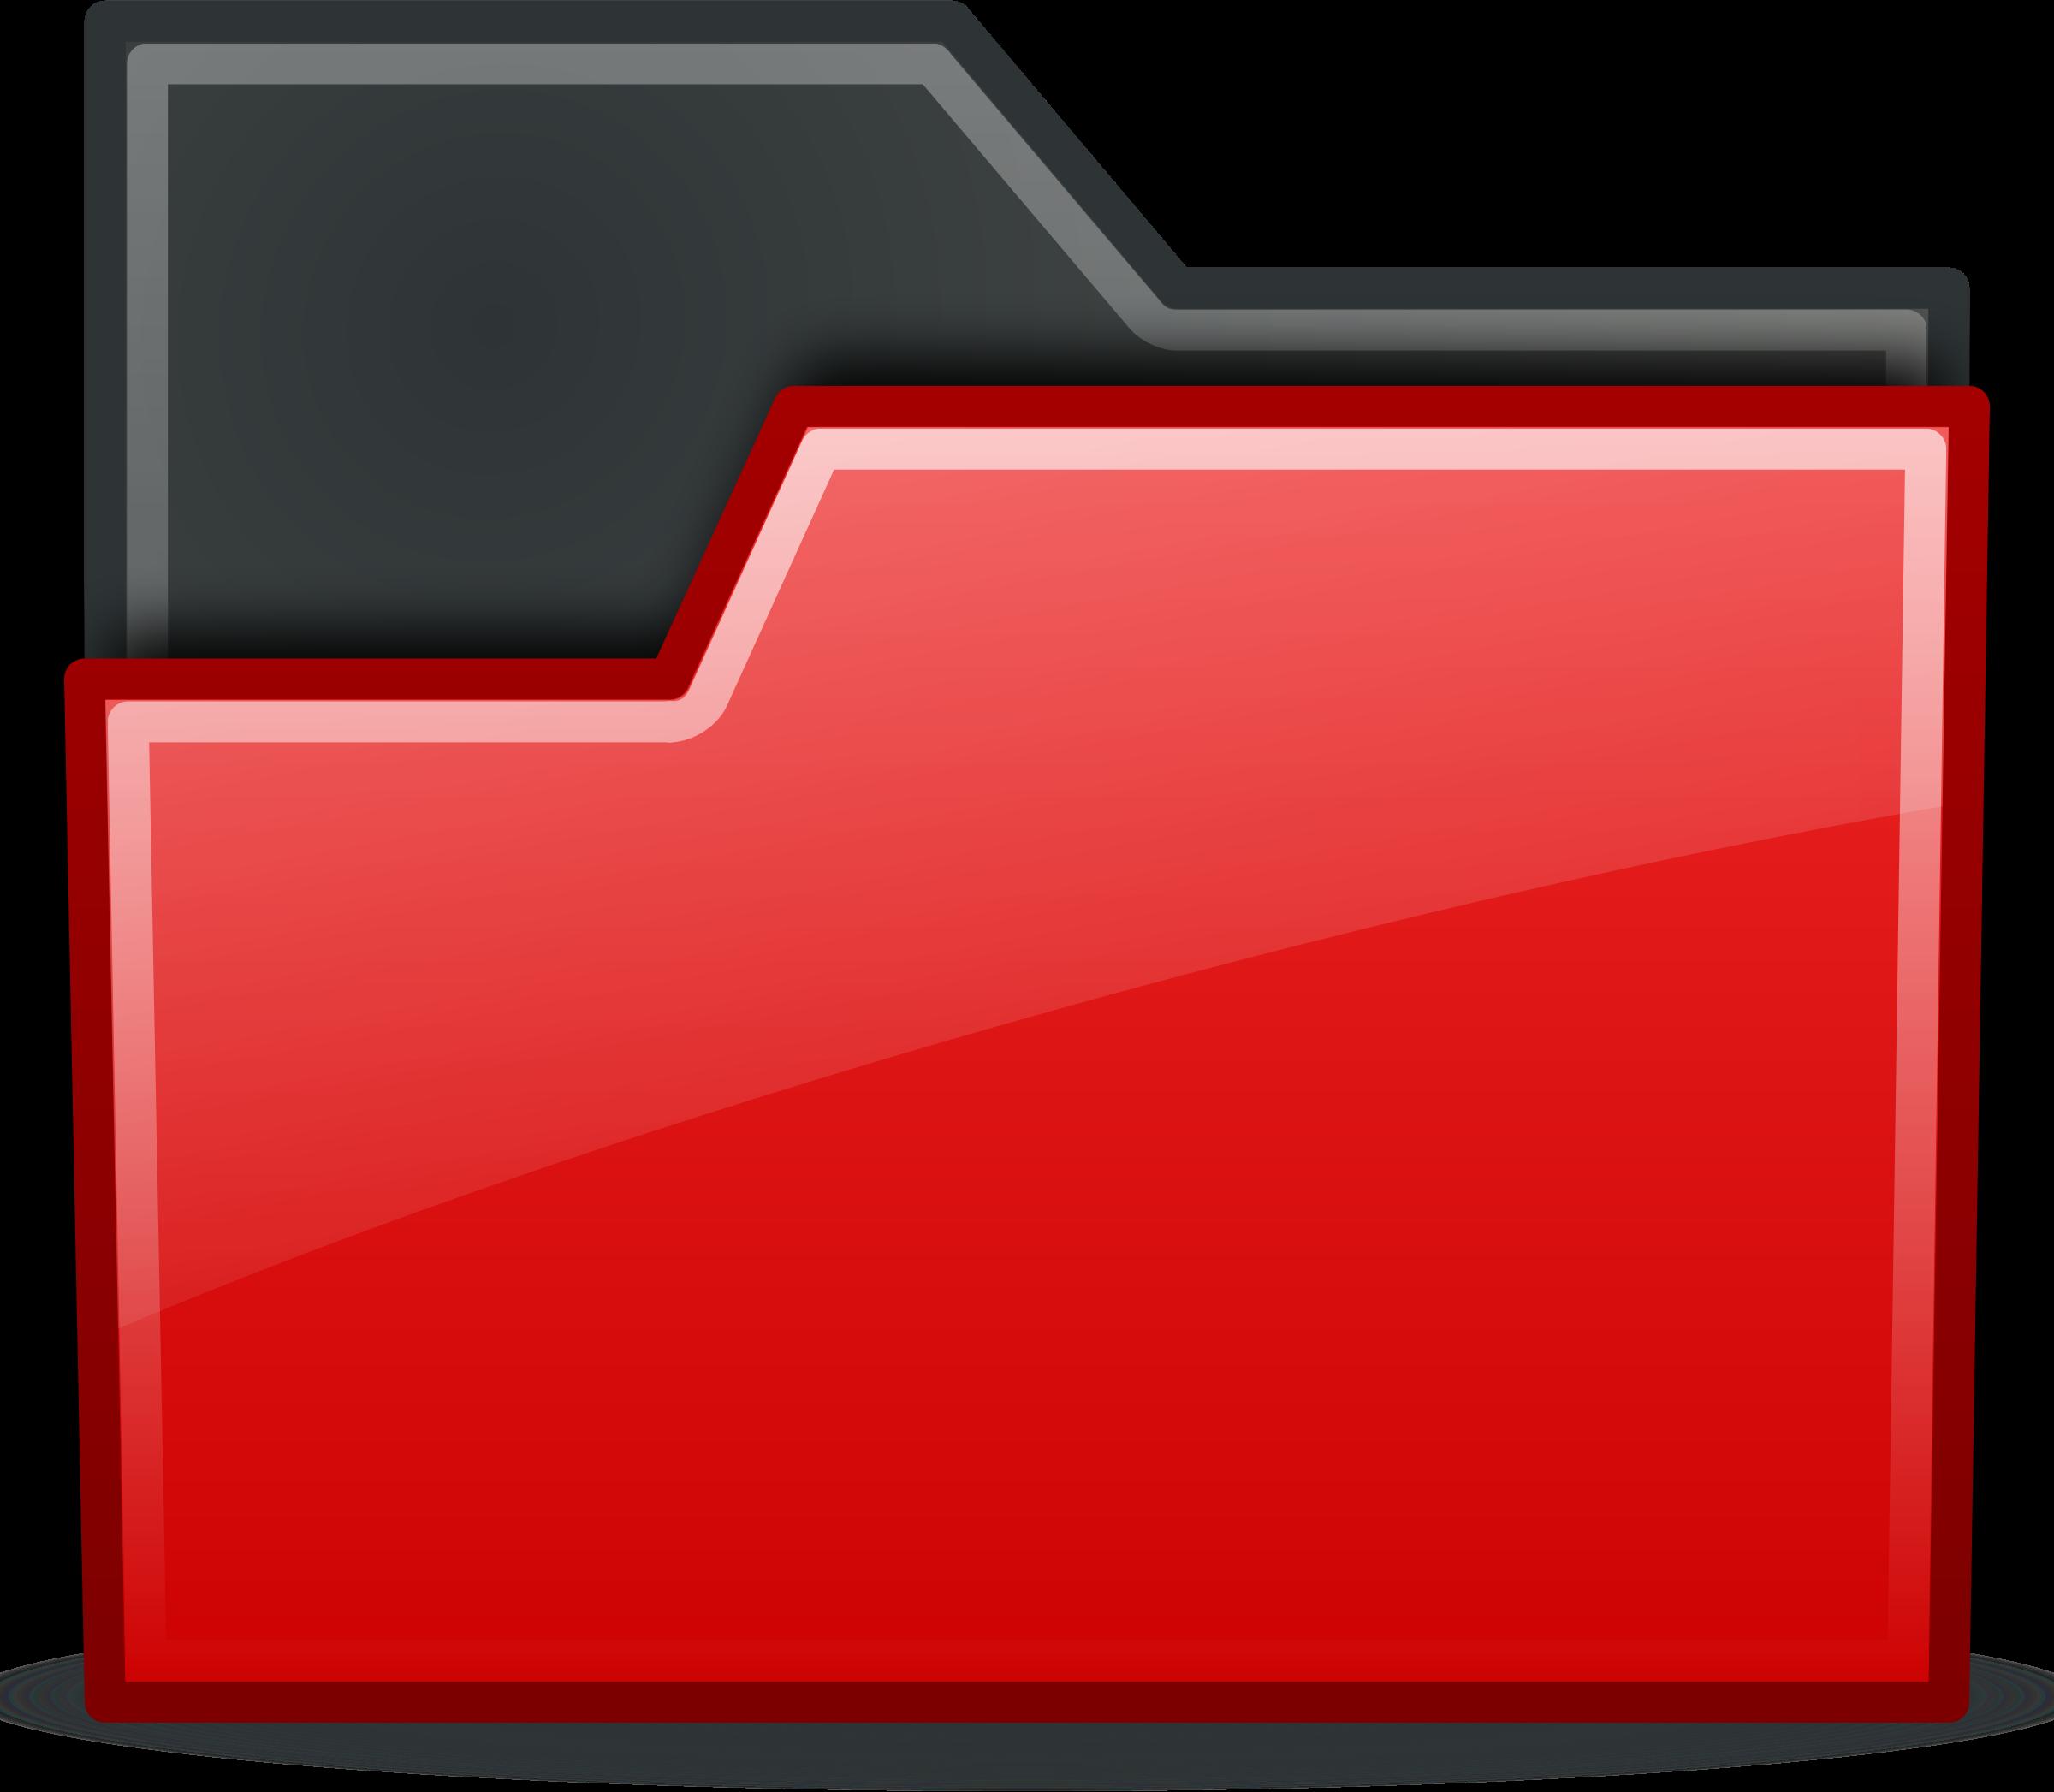 Computer clipart red. Folder big image png